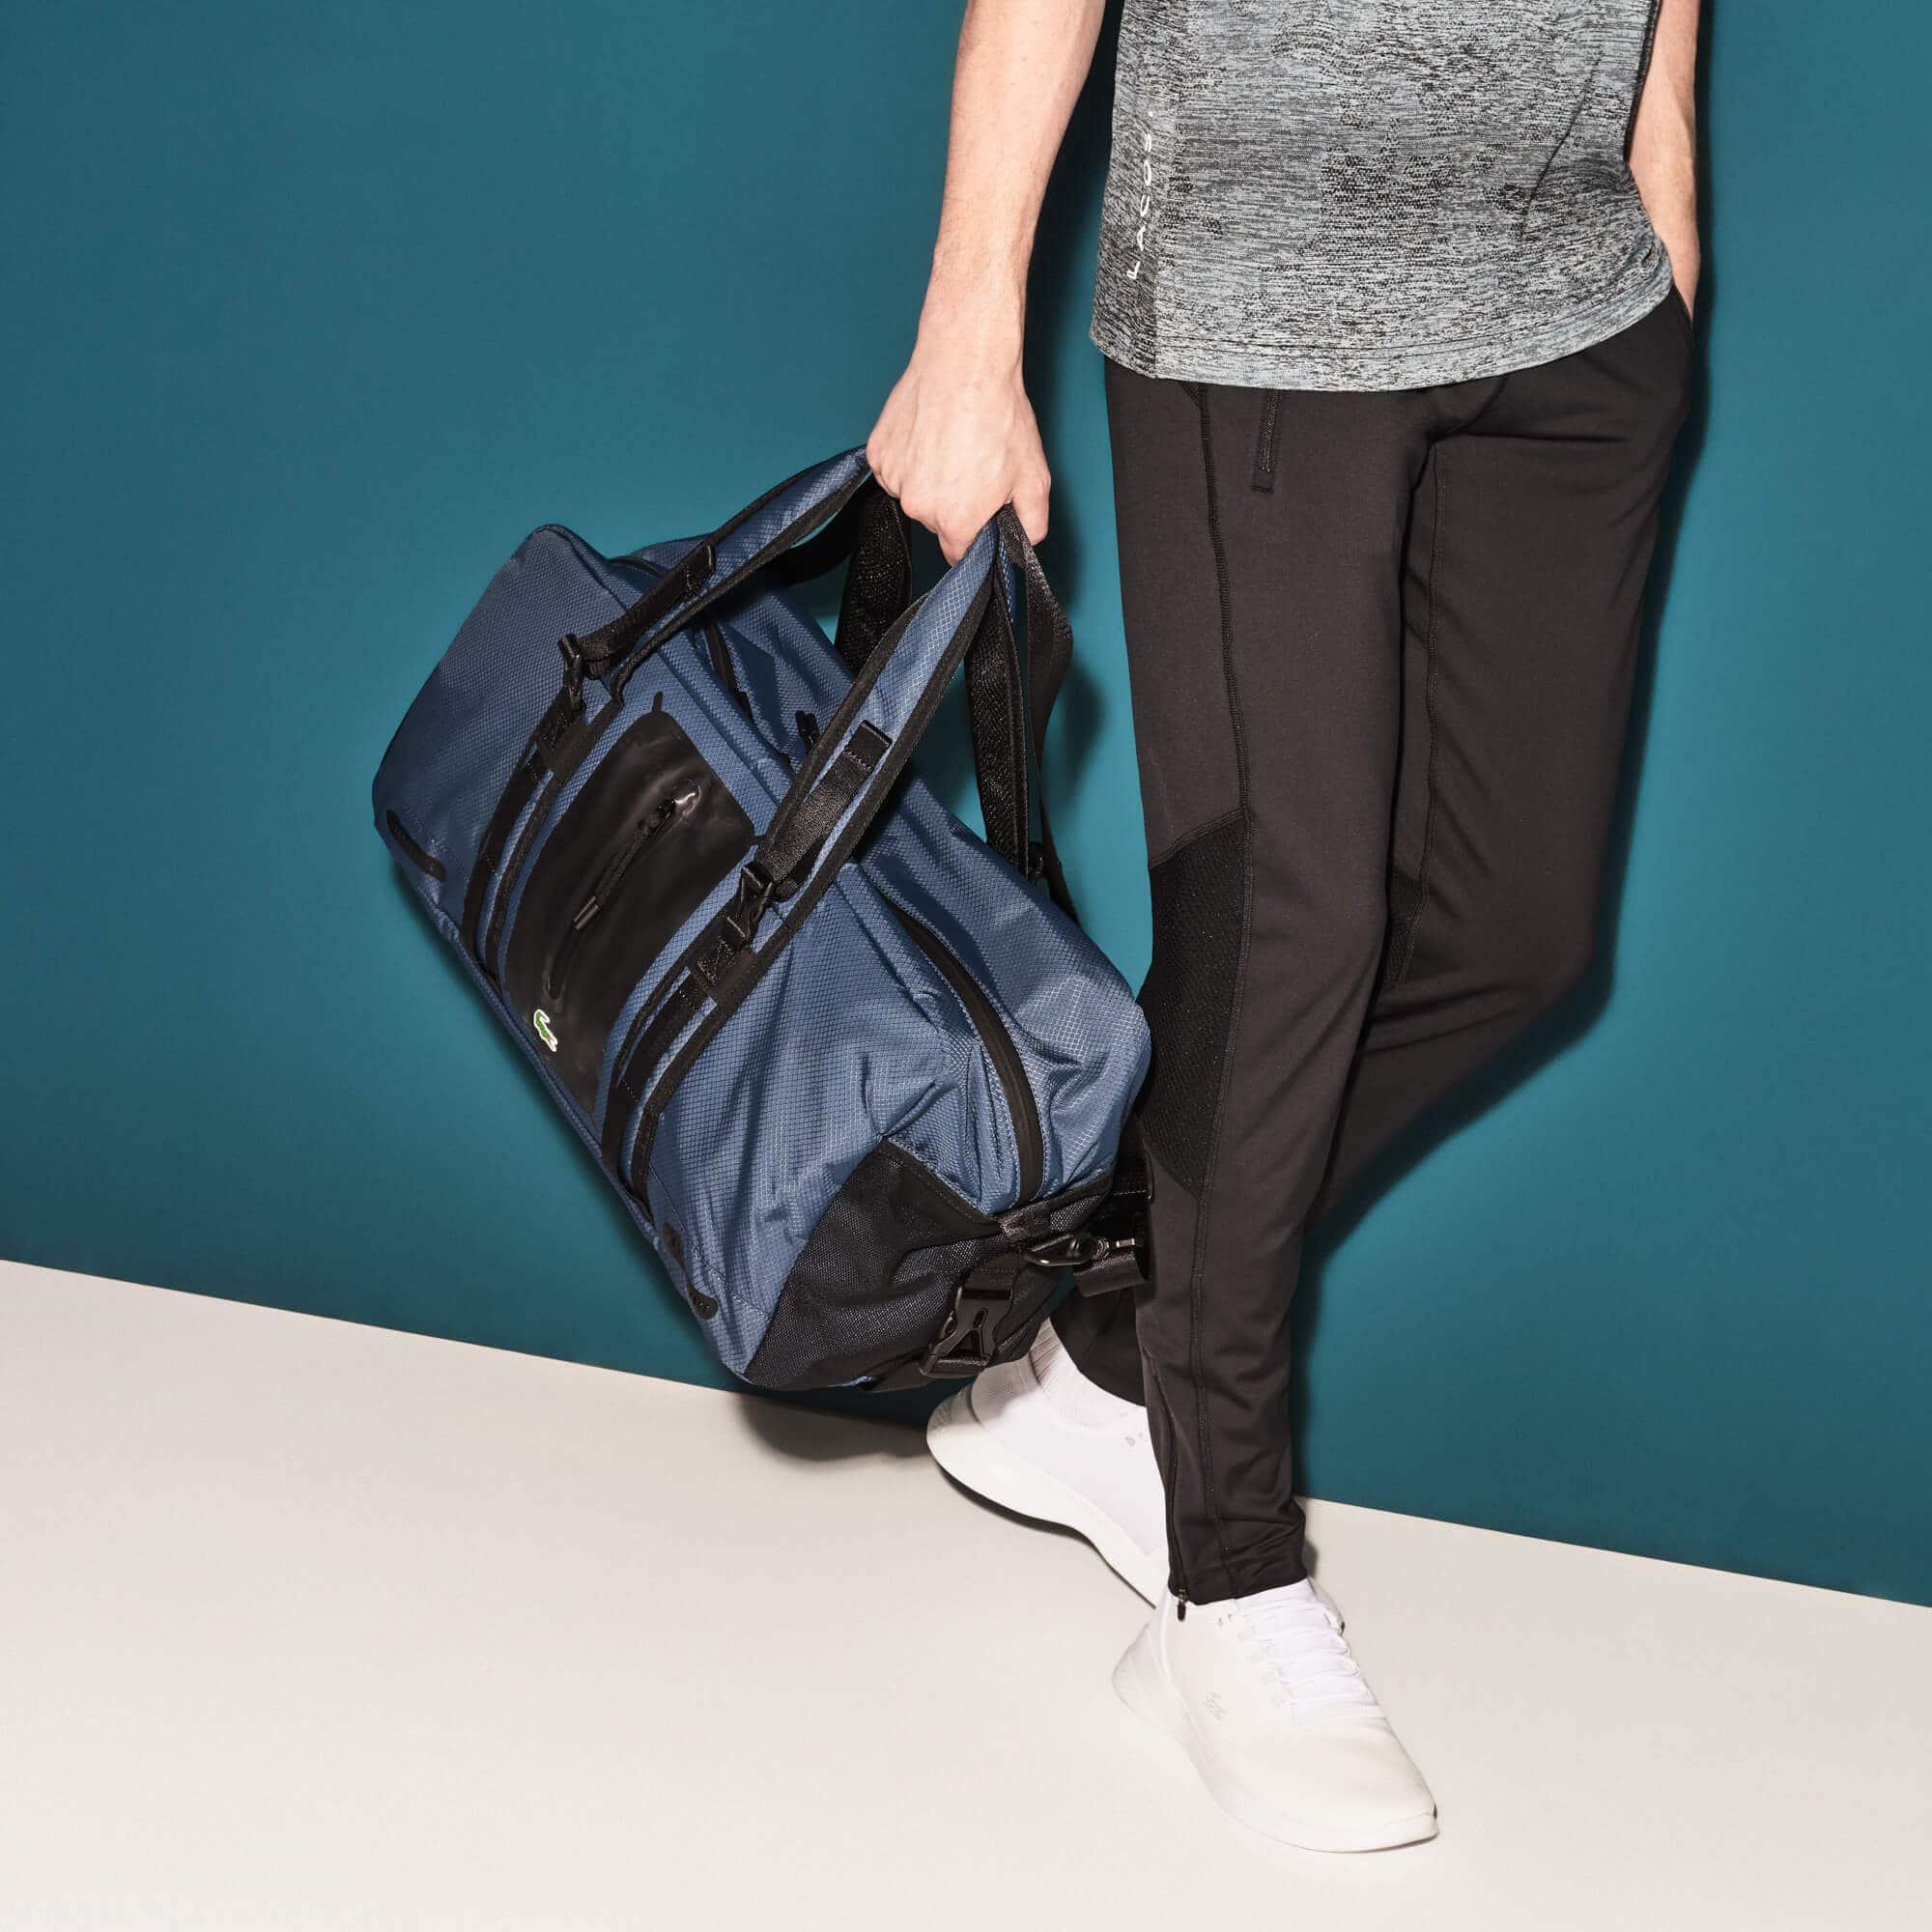 Men's Lacoste SPORT Match Point Nylon Roll Bag